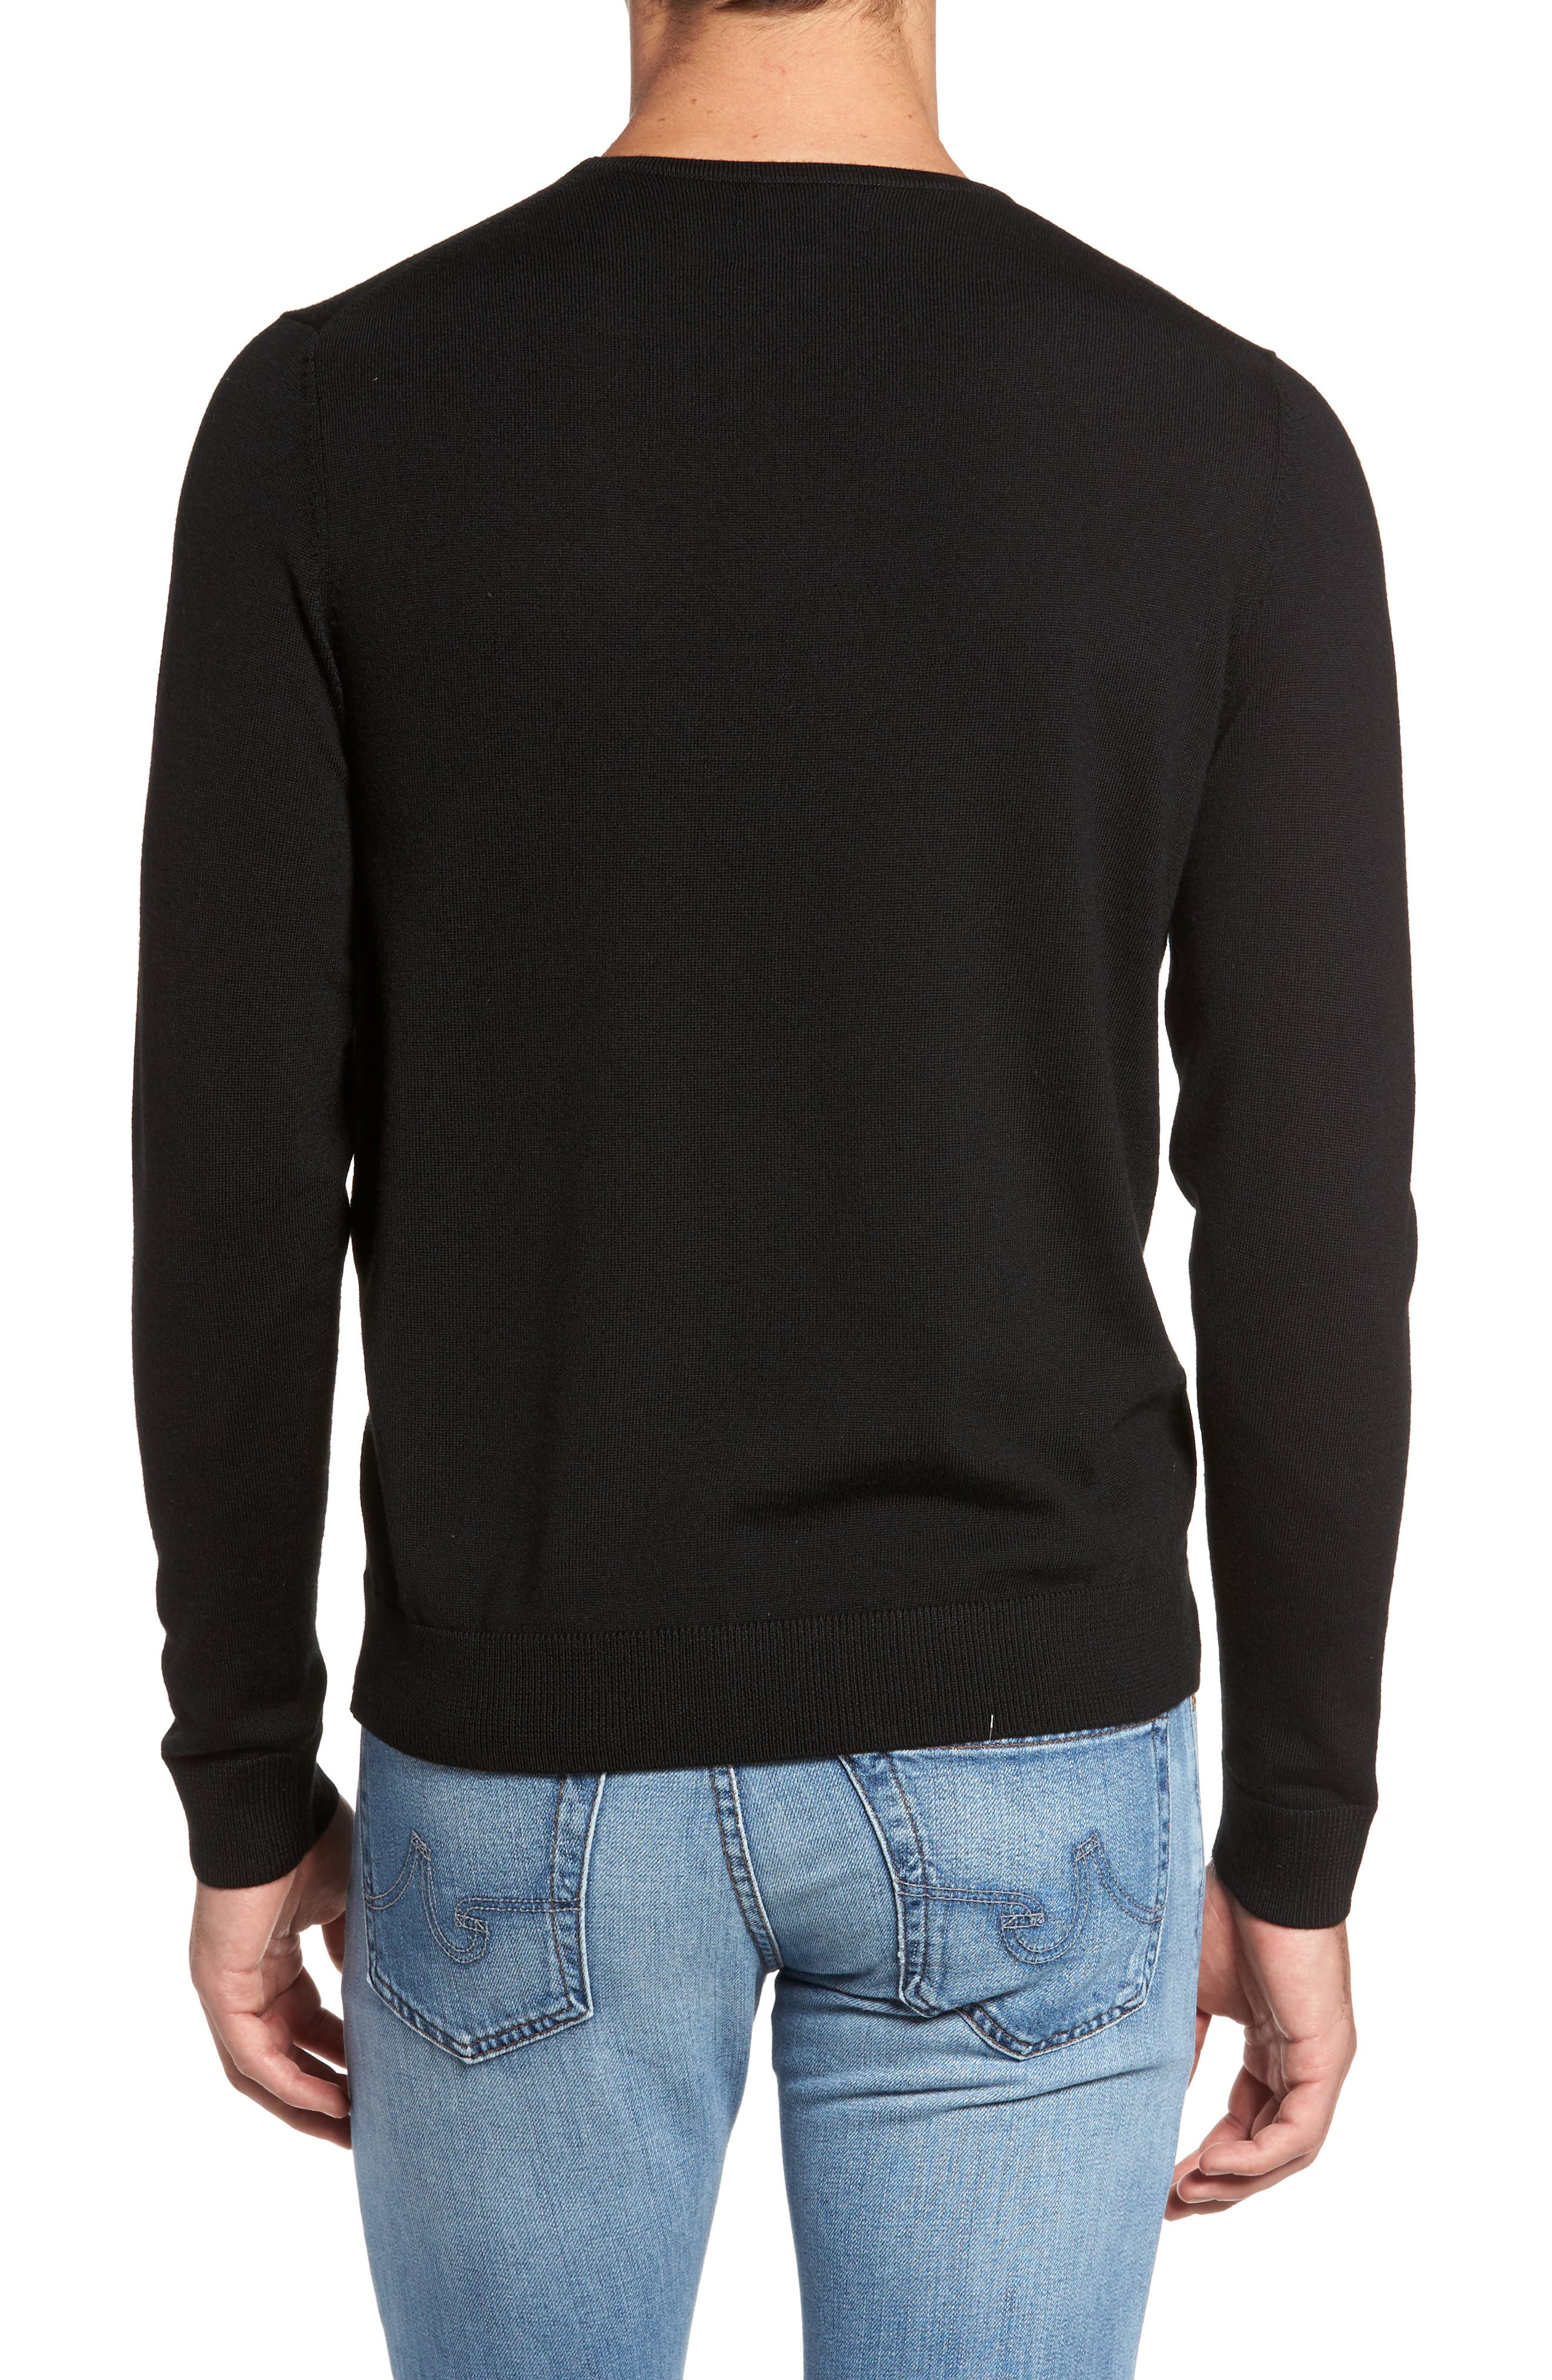 Crewneck Merino Wool Sweater,                             Alternate thumbnail 2, color,                             BLACK CAVIAR